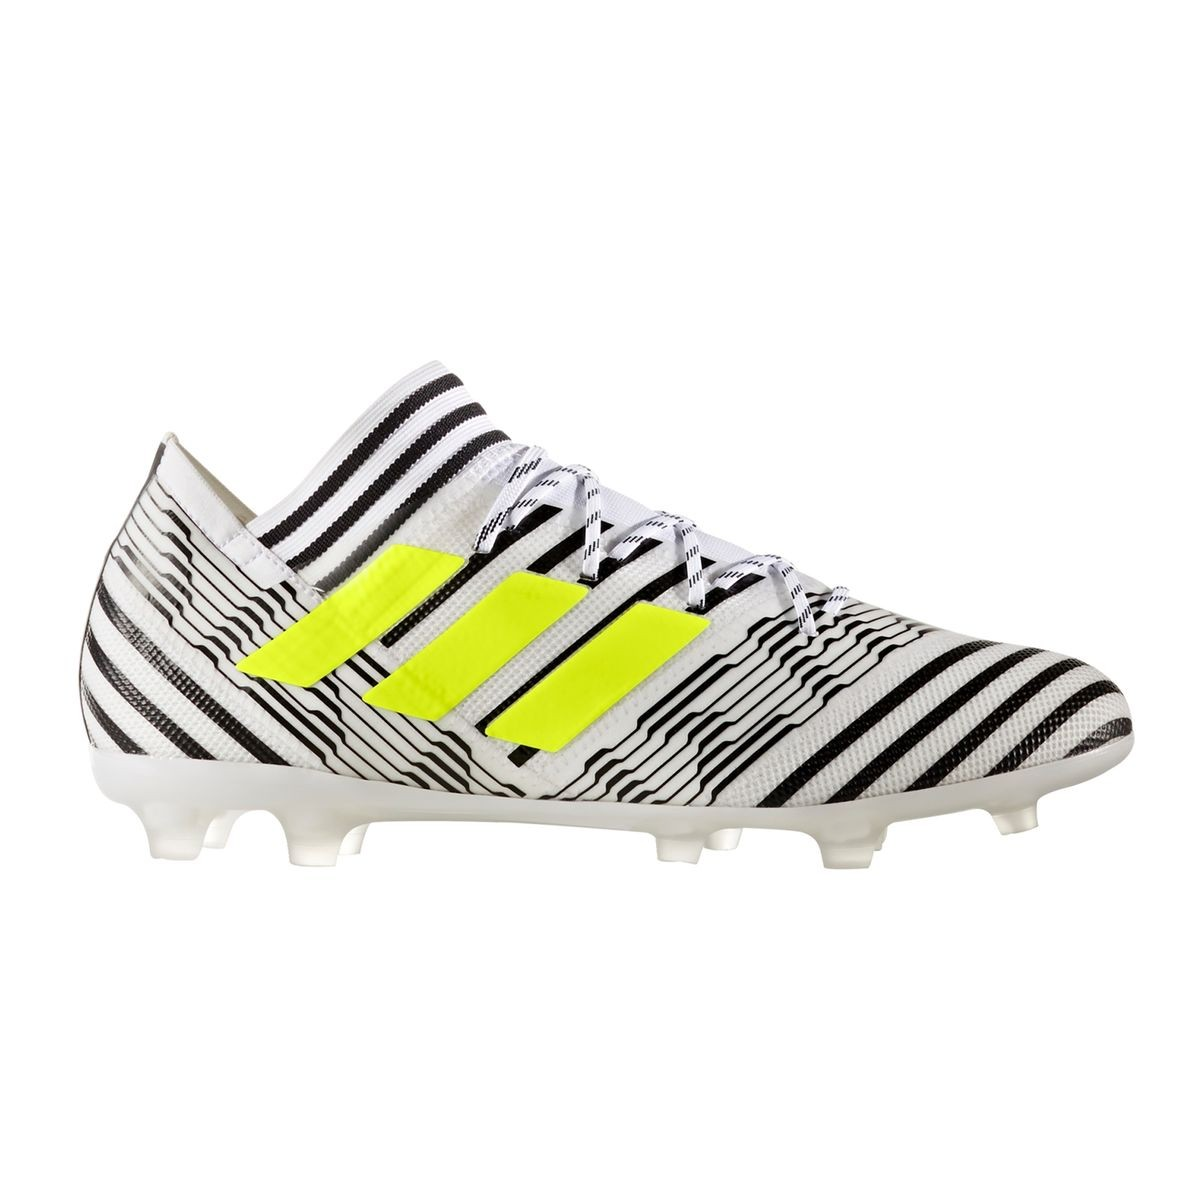 chaussures foot adidas fg noir adulte